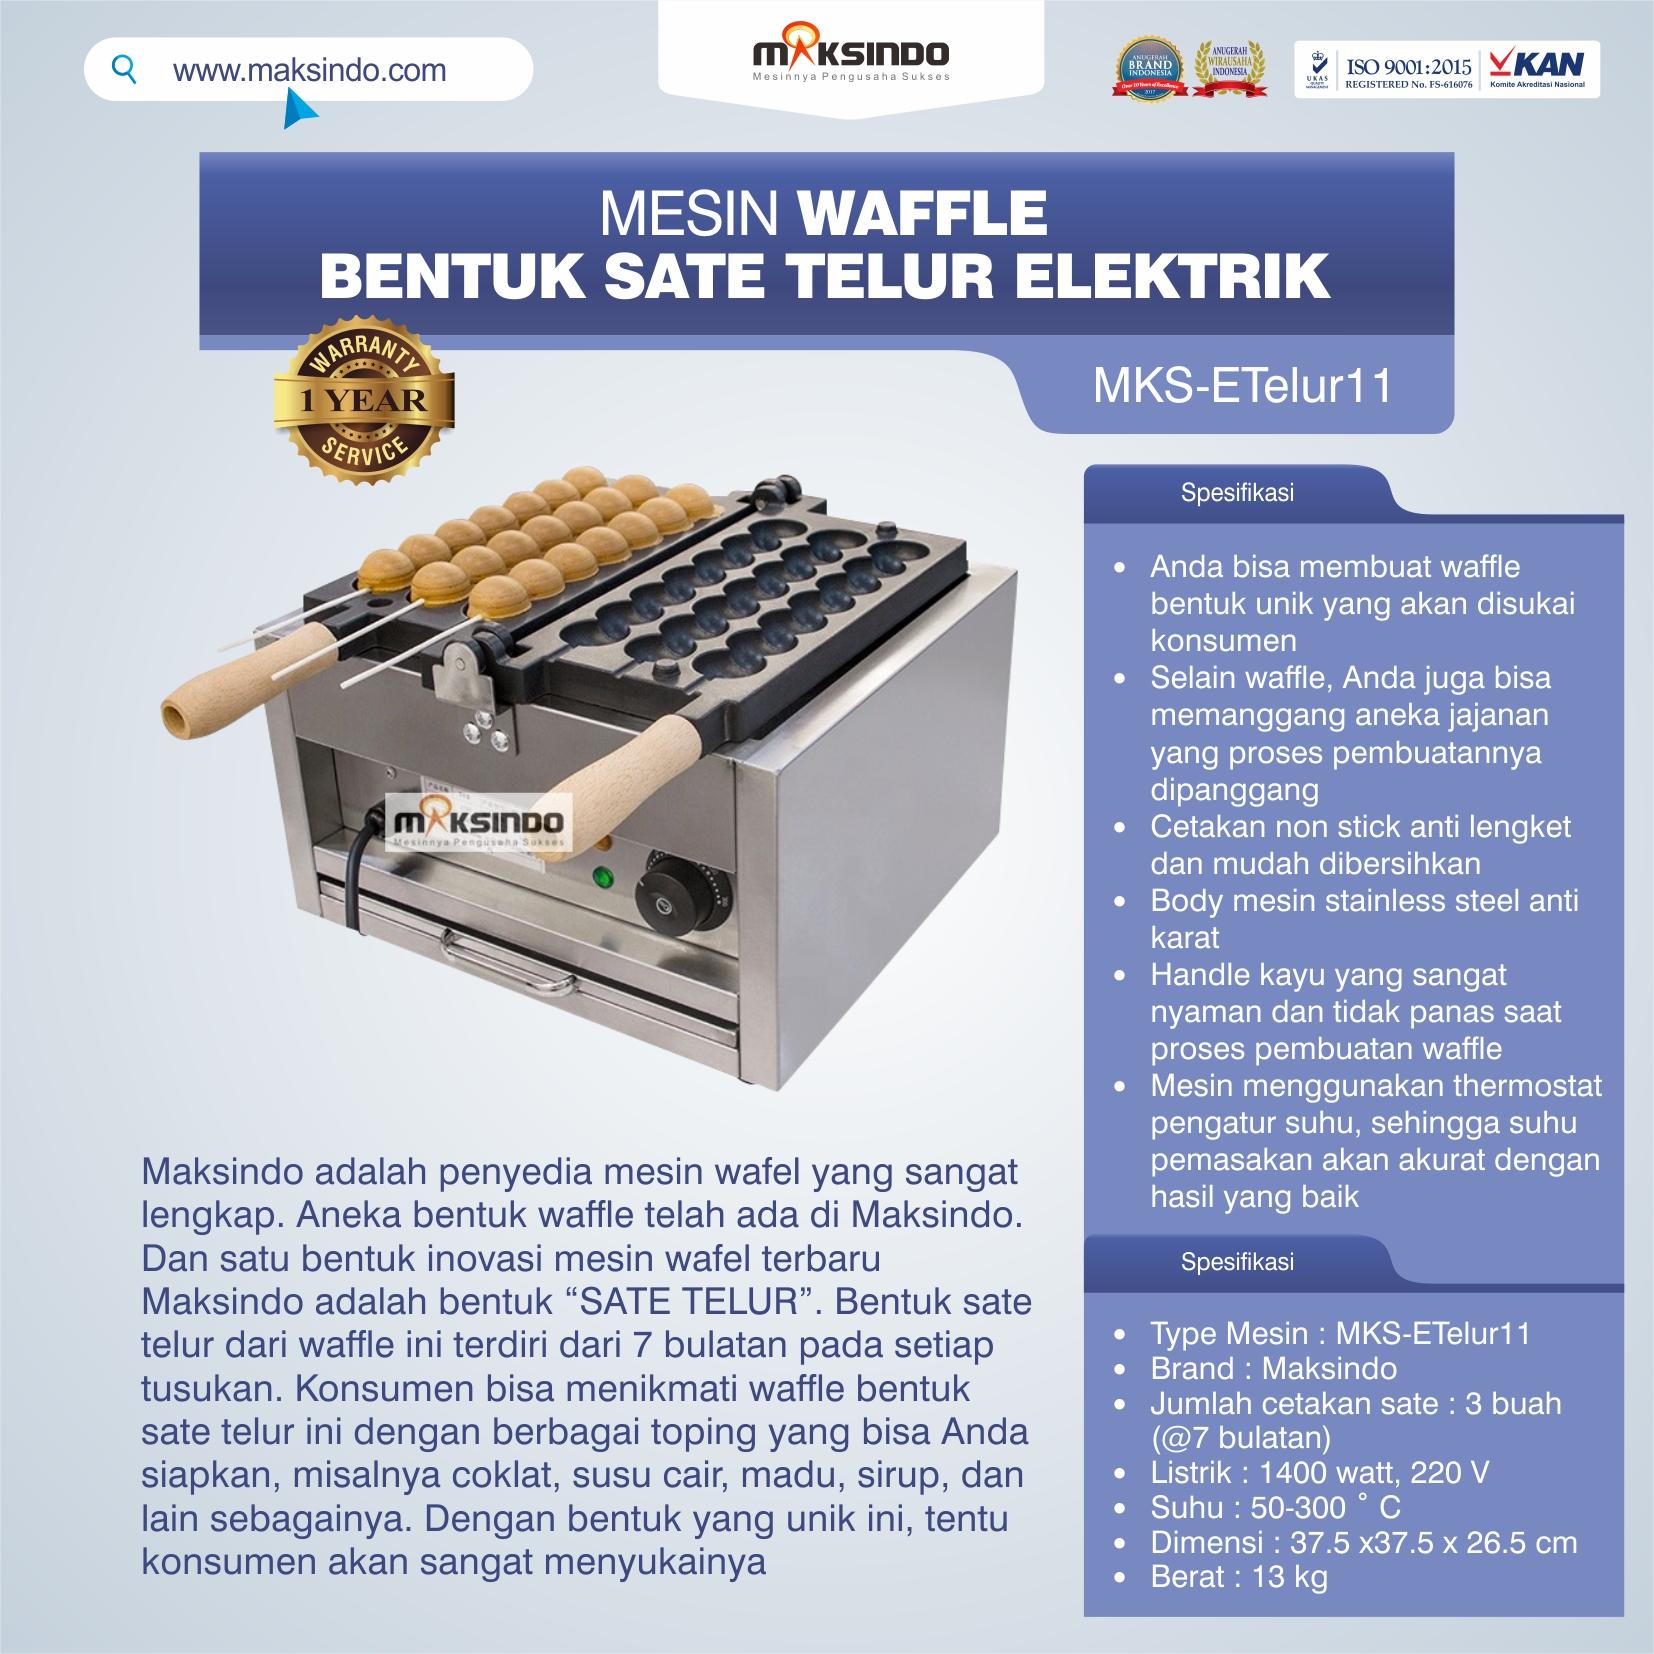 Jual Mesin Waffle Bentuk Sate Telur Elektrik – MKS-ETelur11 di Makassar